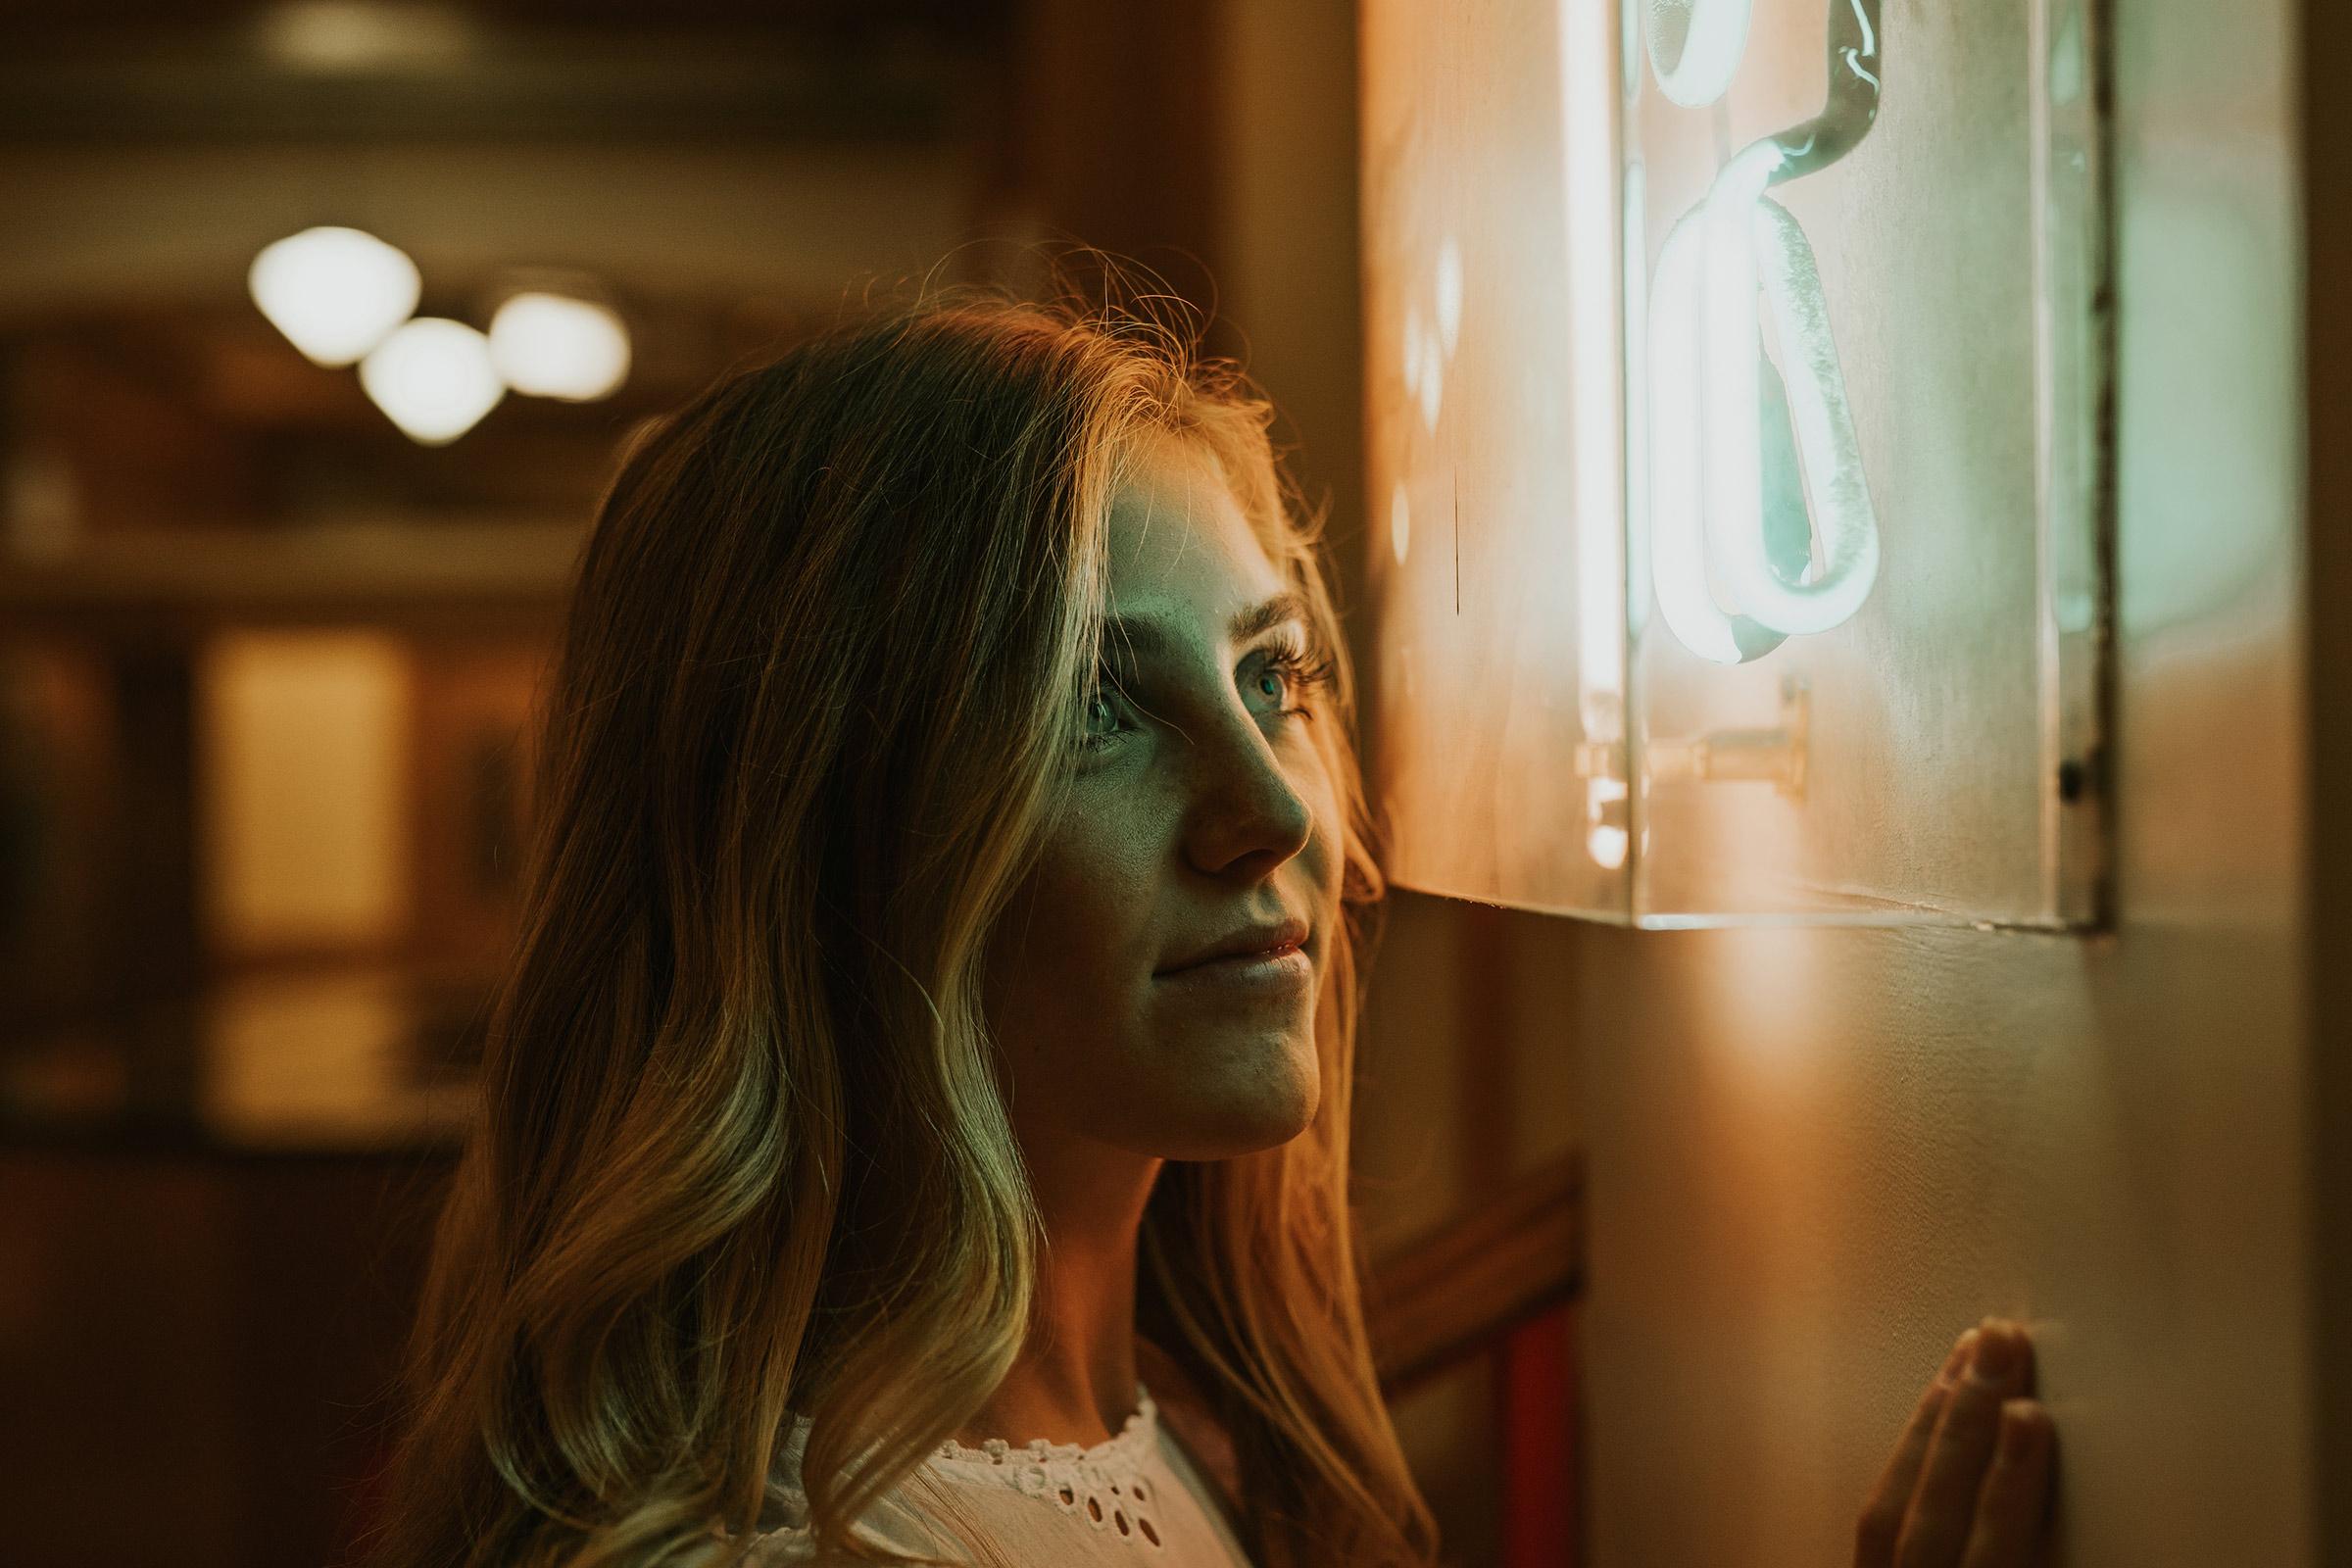 meg-senior-neon-lights-ankeny-high-school-desmoines-iowa-raelyn-ramey-photography-66.jpg